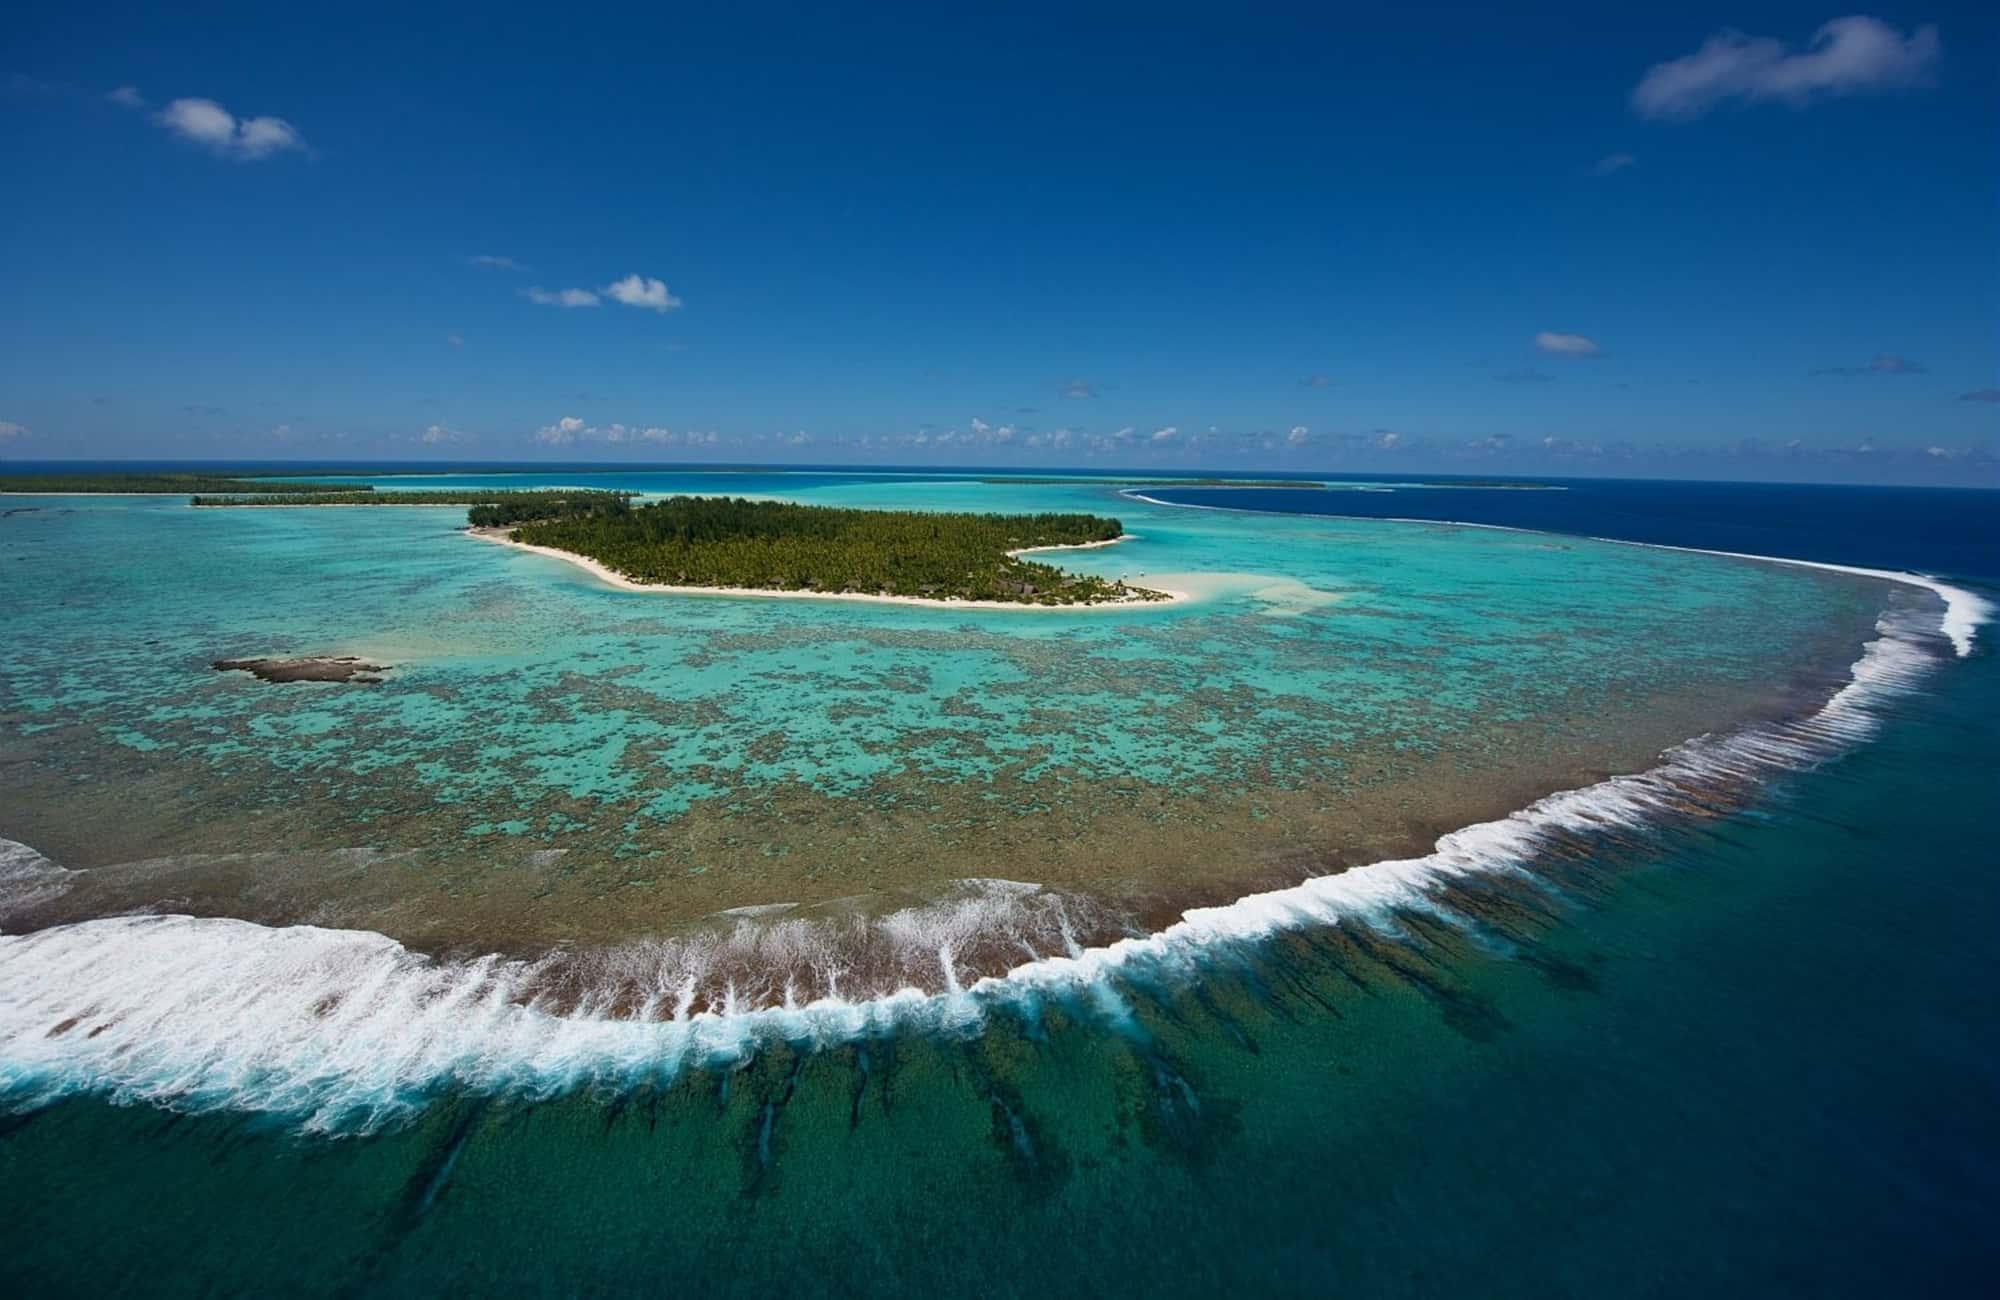 Voyage Polynésie Française - Tetiaroa - Amplitudes